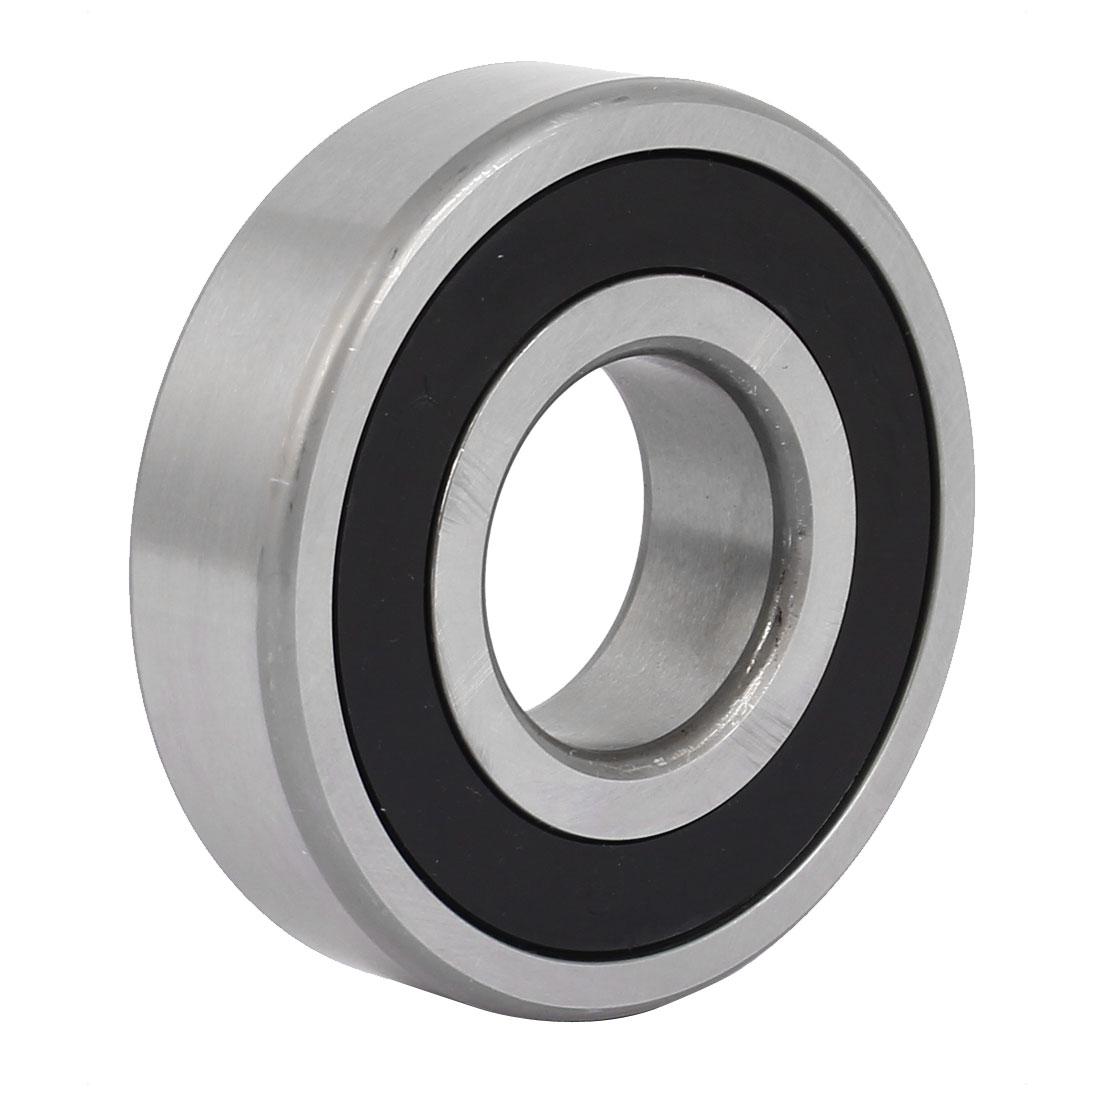 RZ6308 Double Shielded Deep Groove Ball Bearing 90mmx40mmx23mm